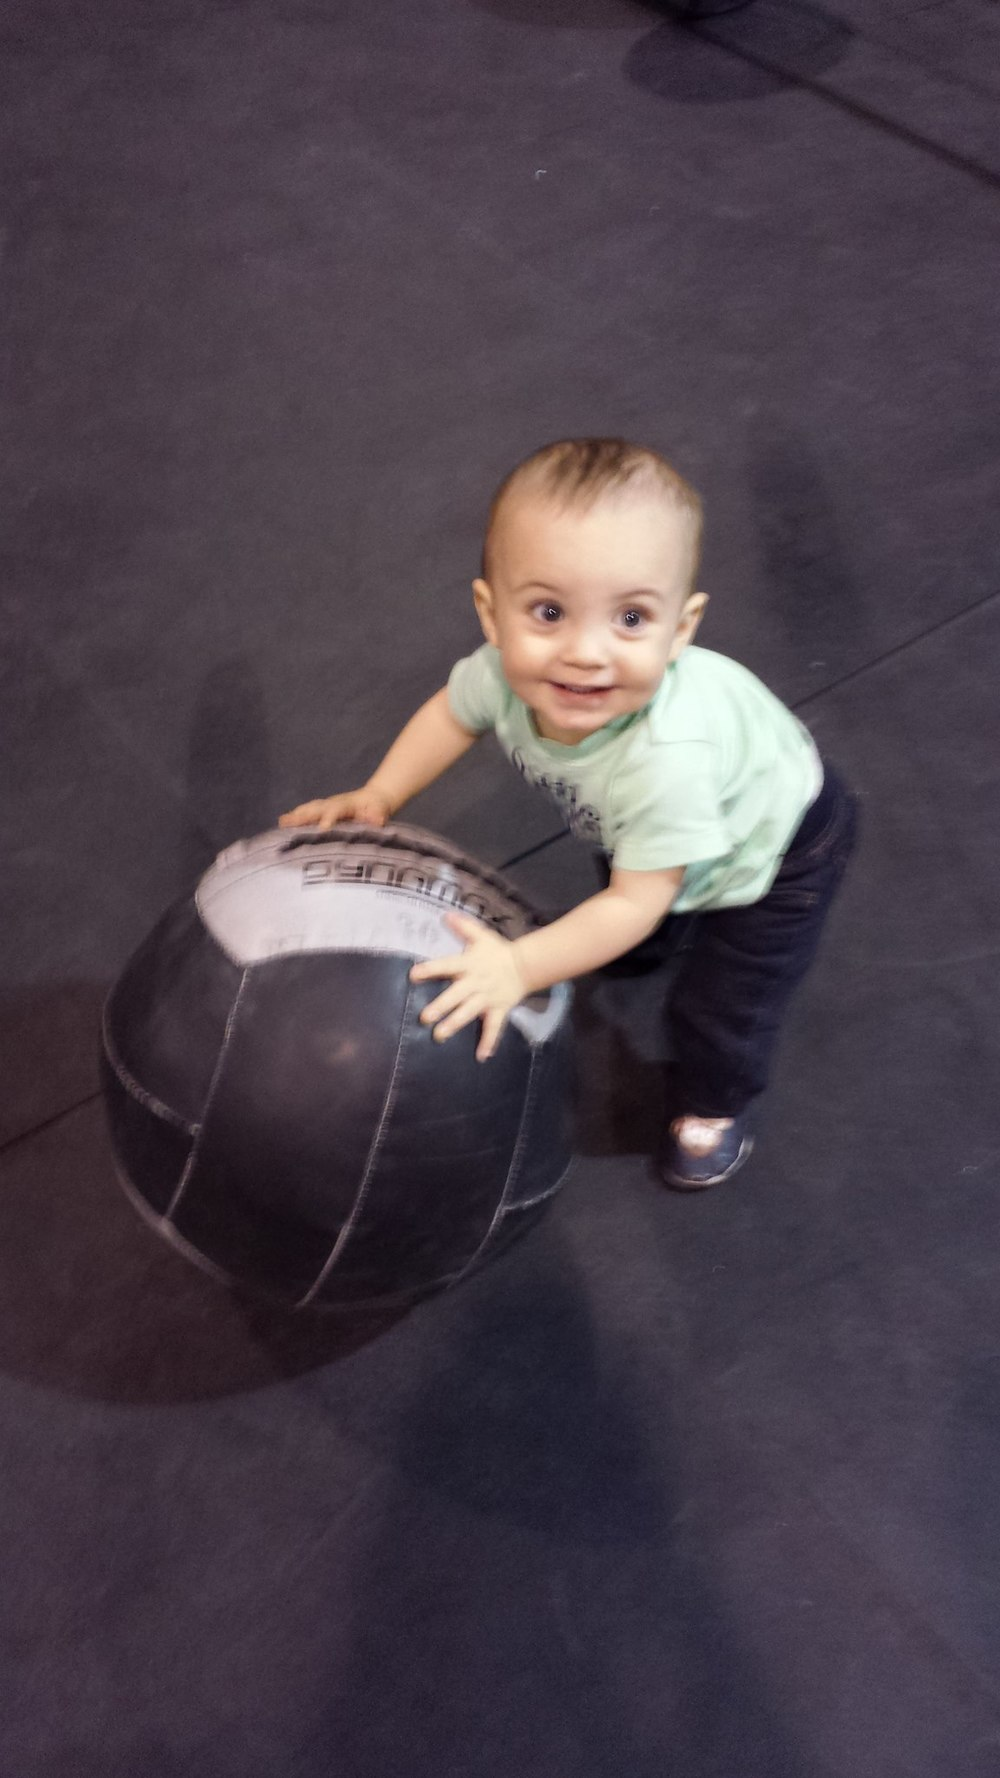 Future Crossfitter!